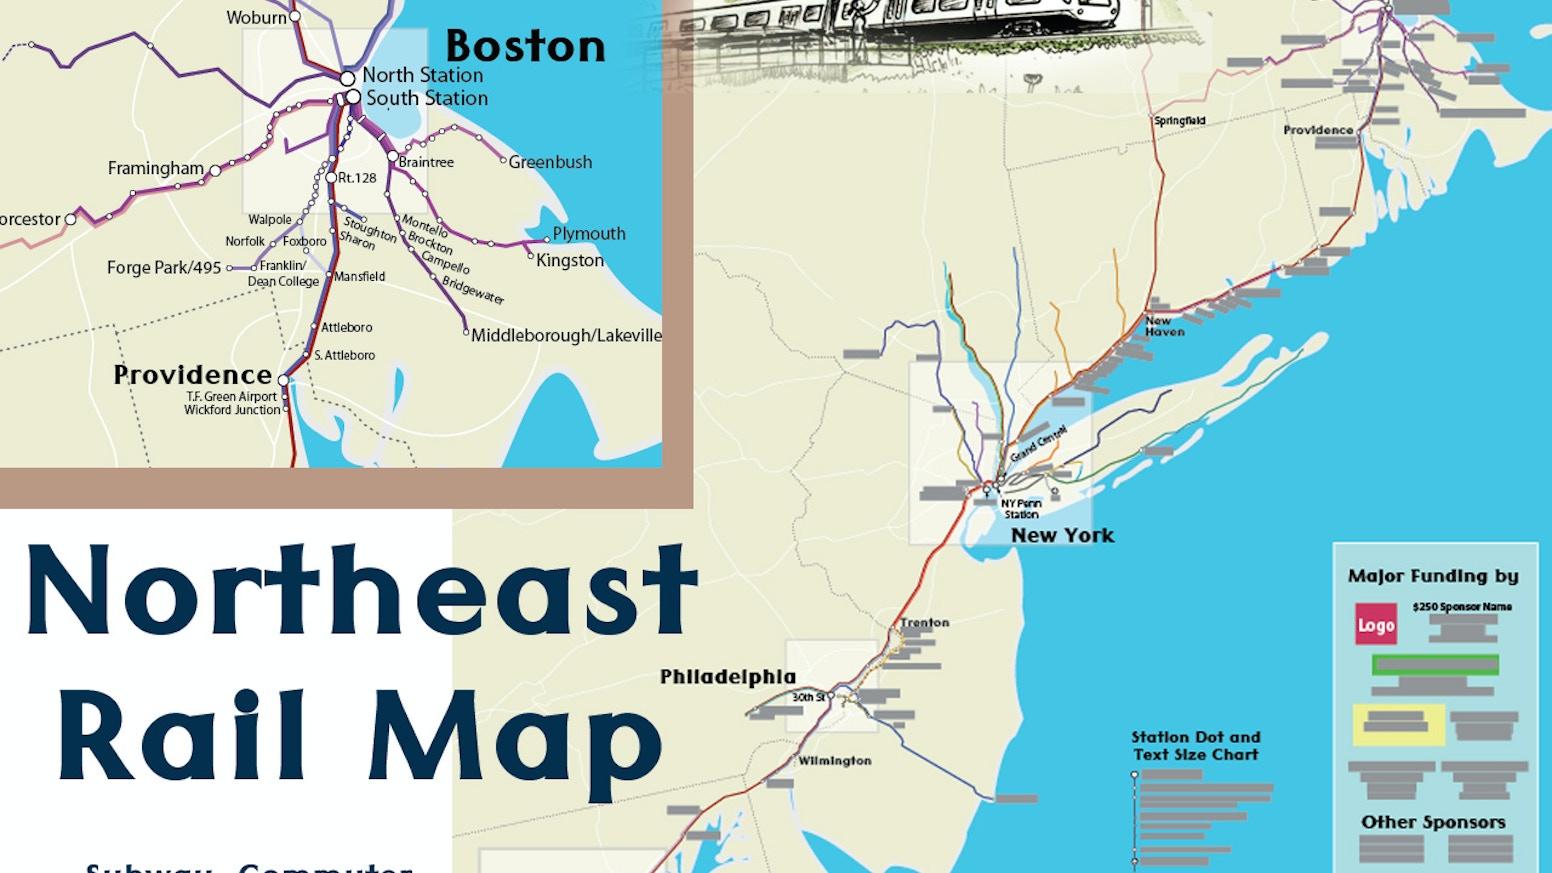 Northeast Us Rail Map By Alfred Baltimore Closeup Kickstarter - Us-map-close-up